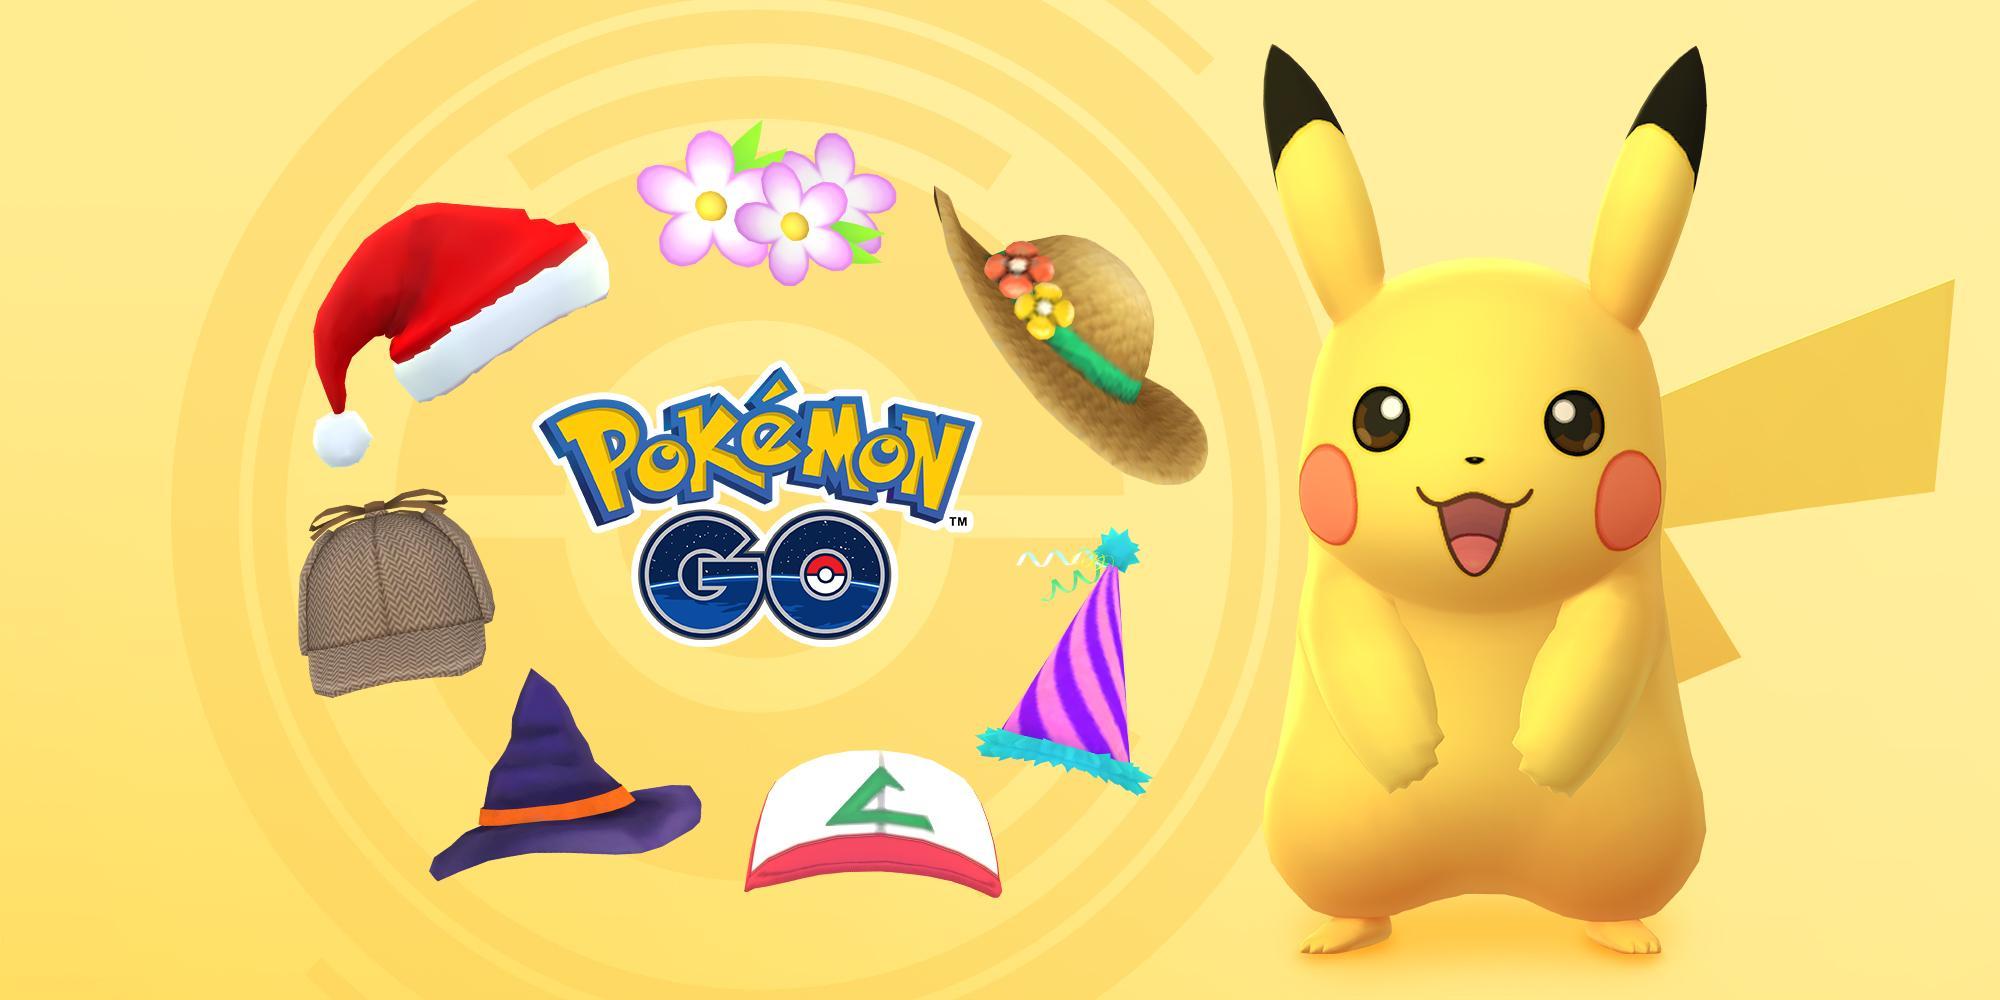 Pokemon GO événement Pokemon GO ramène Ash hat Pikachu